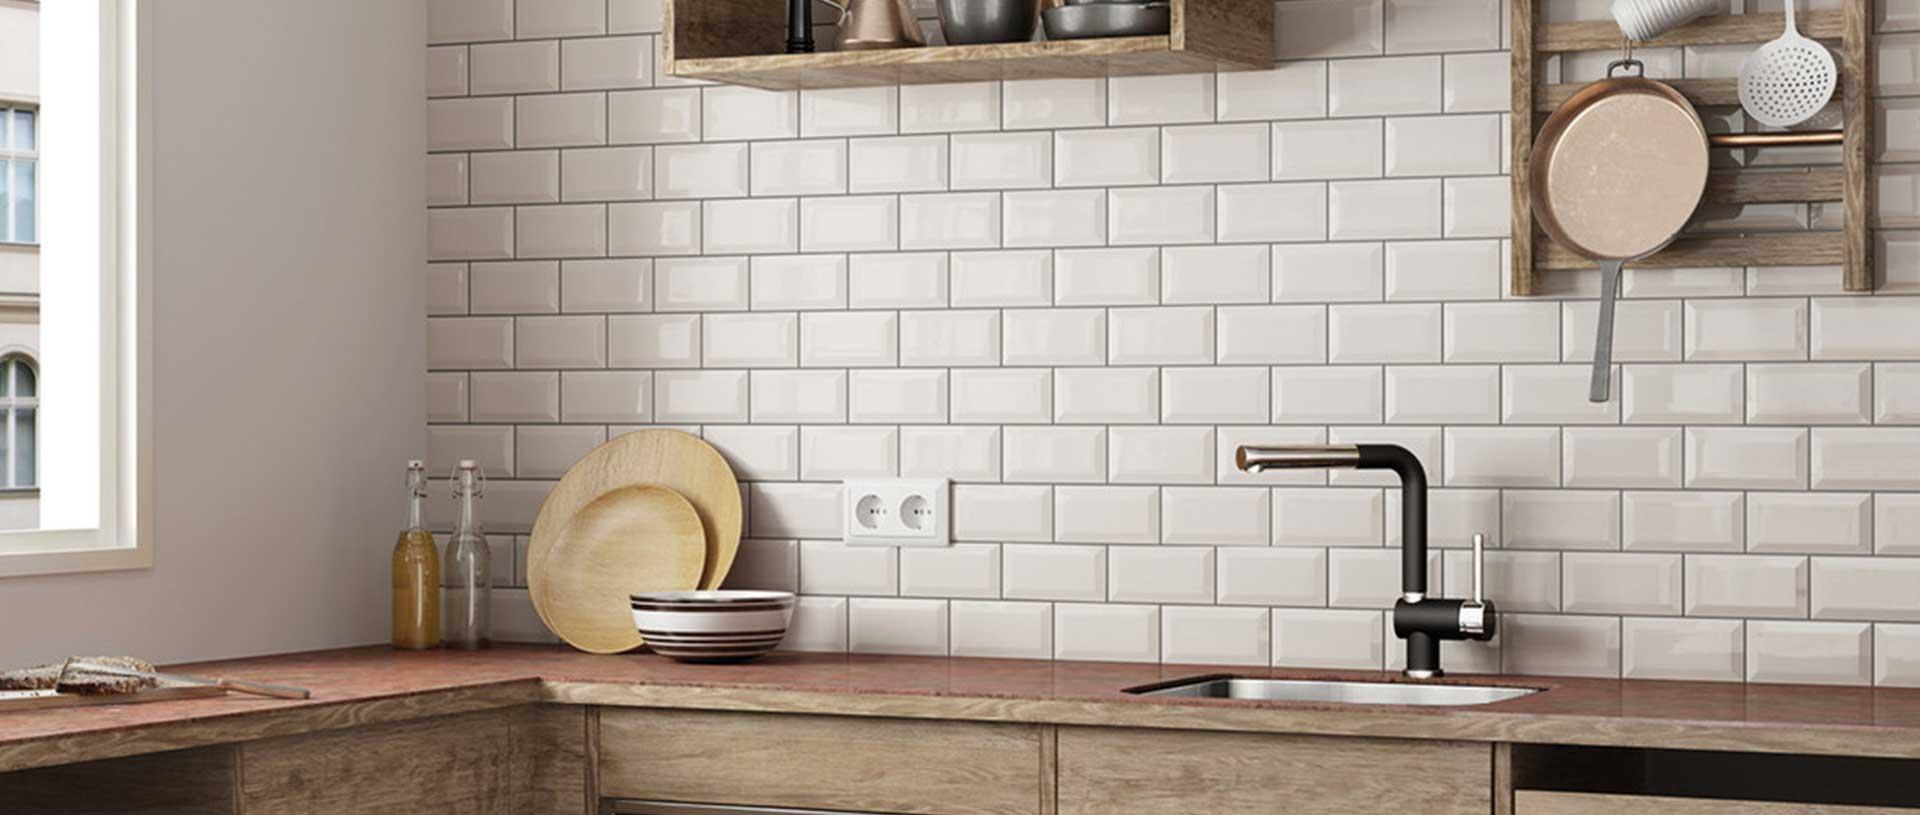 Плитка для кухни                50 % скидка